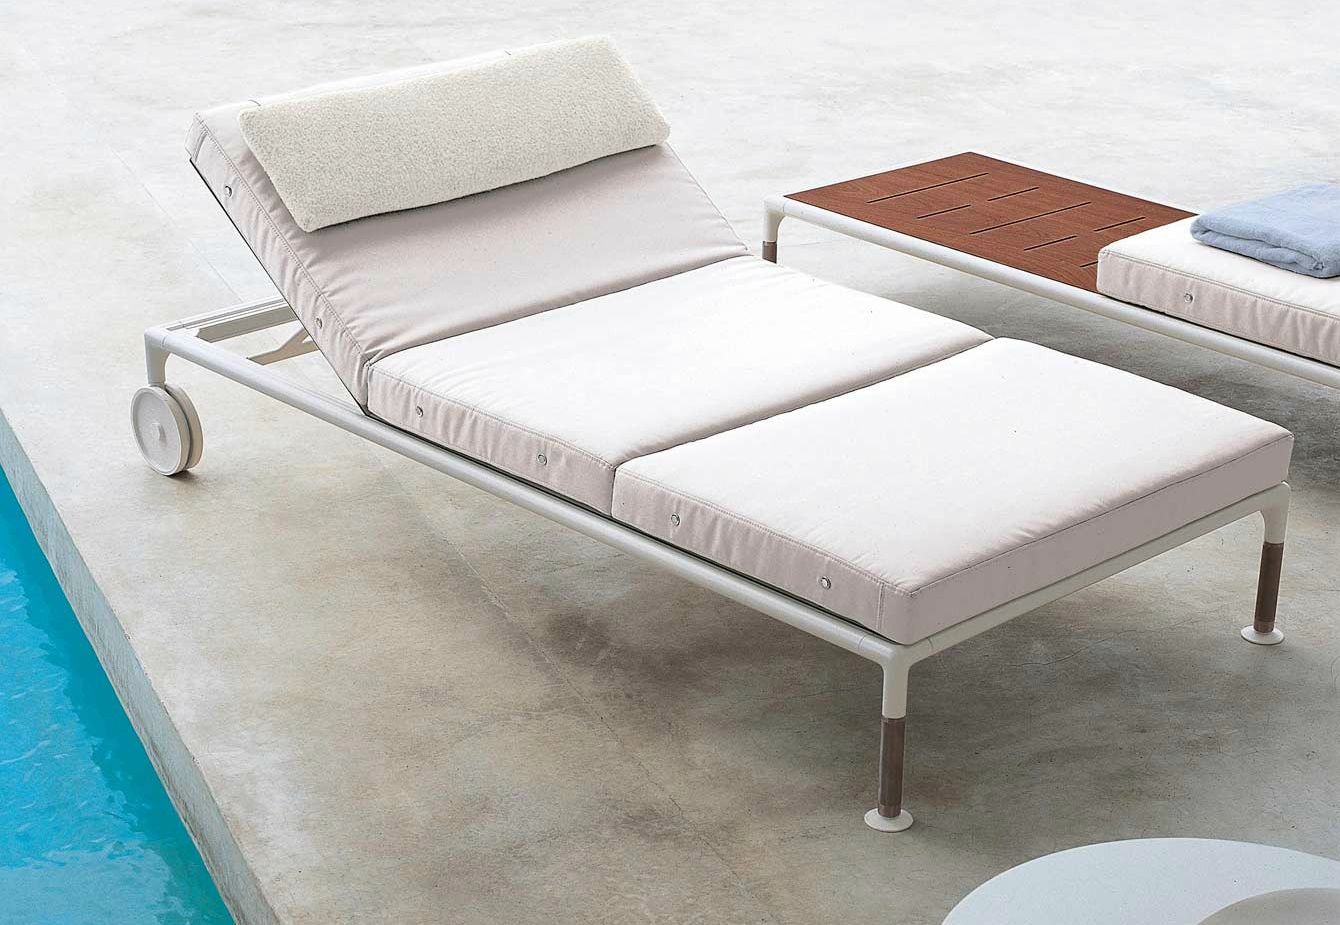 springtime gartenliege mit rollen by b b italia outdoor a. Black Bedroom Furniture Sets. Home Design Ideas